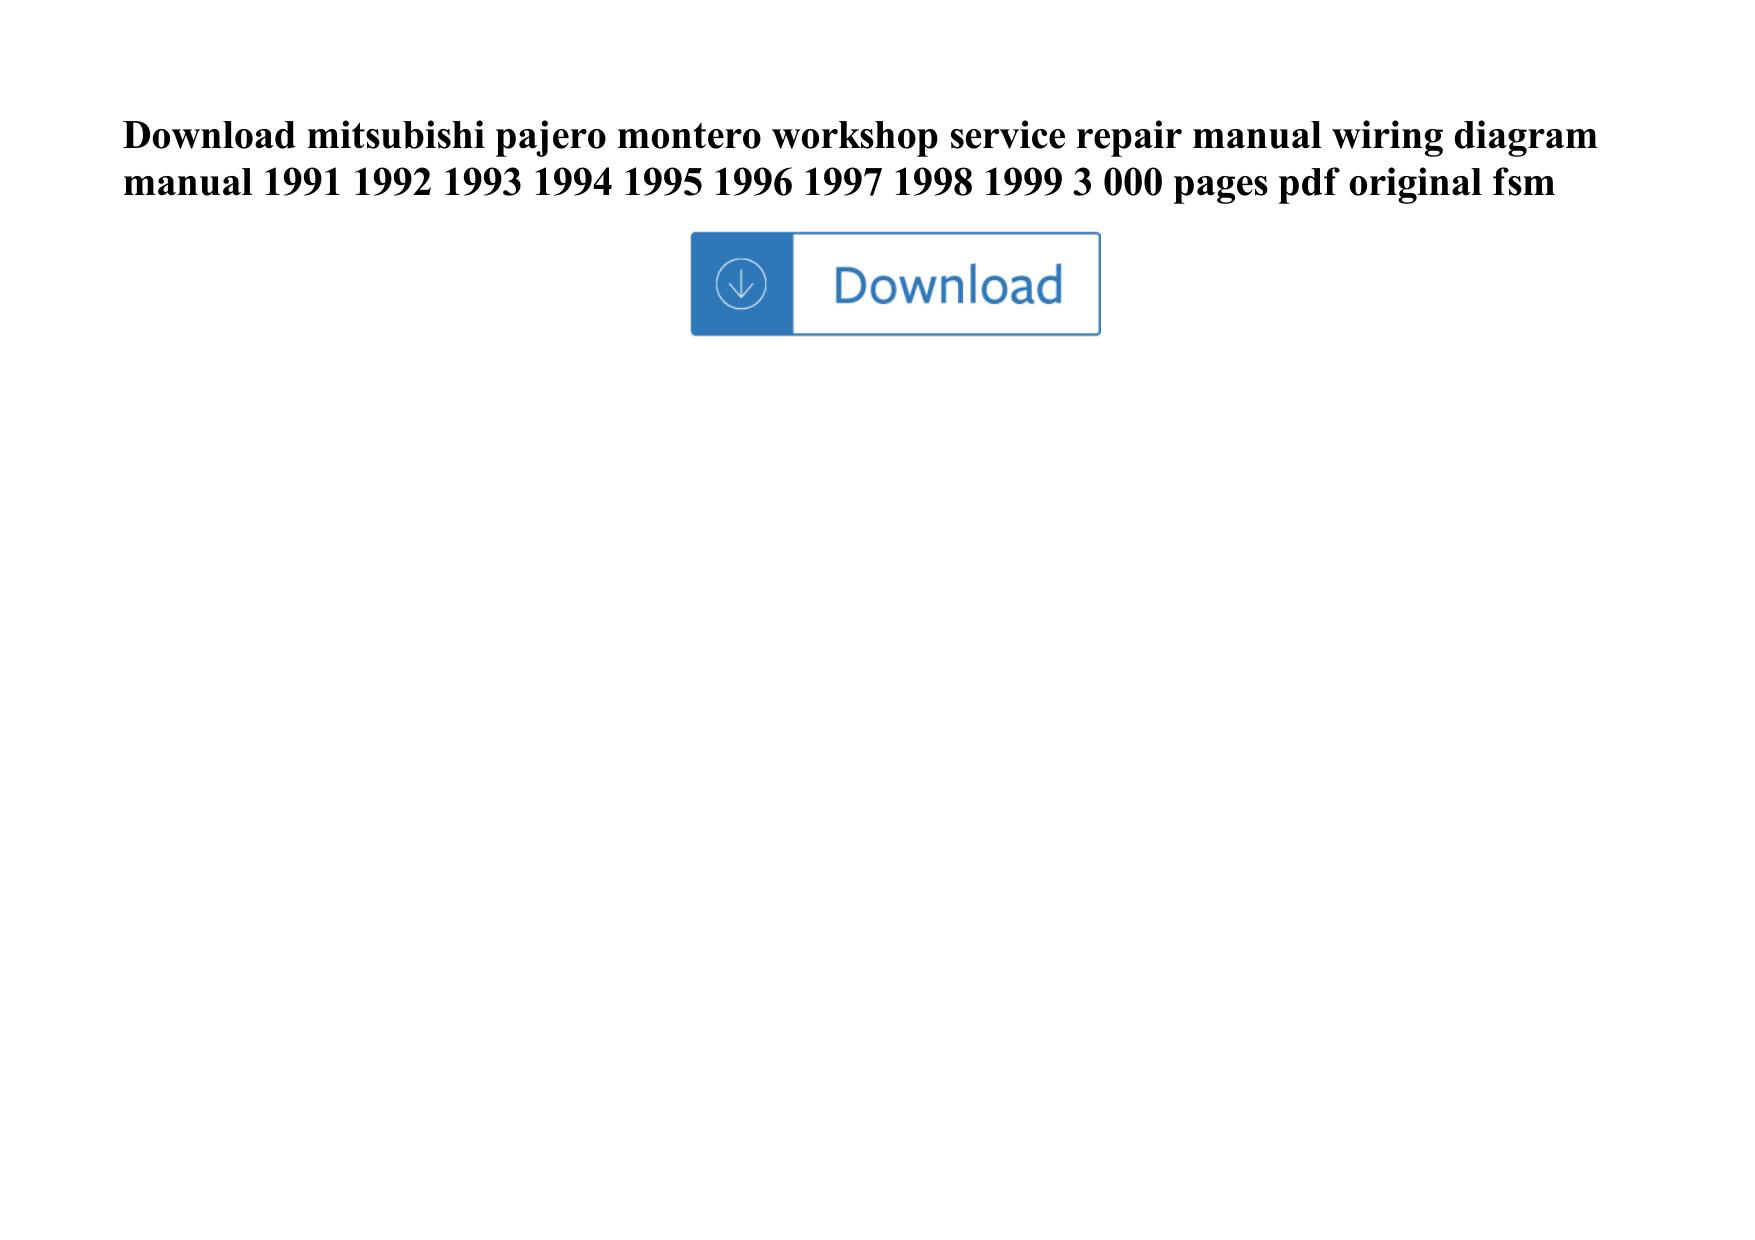 Mitsubishi Pajero Montero Workshop Service Repair Manual Wiring Diagram 1991 1992 1993 1994 1995 1996 1997 1998 1999 3 00